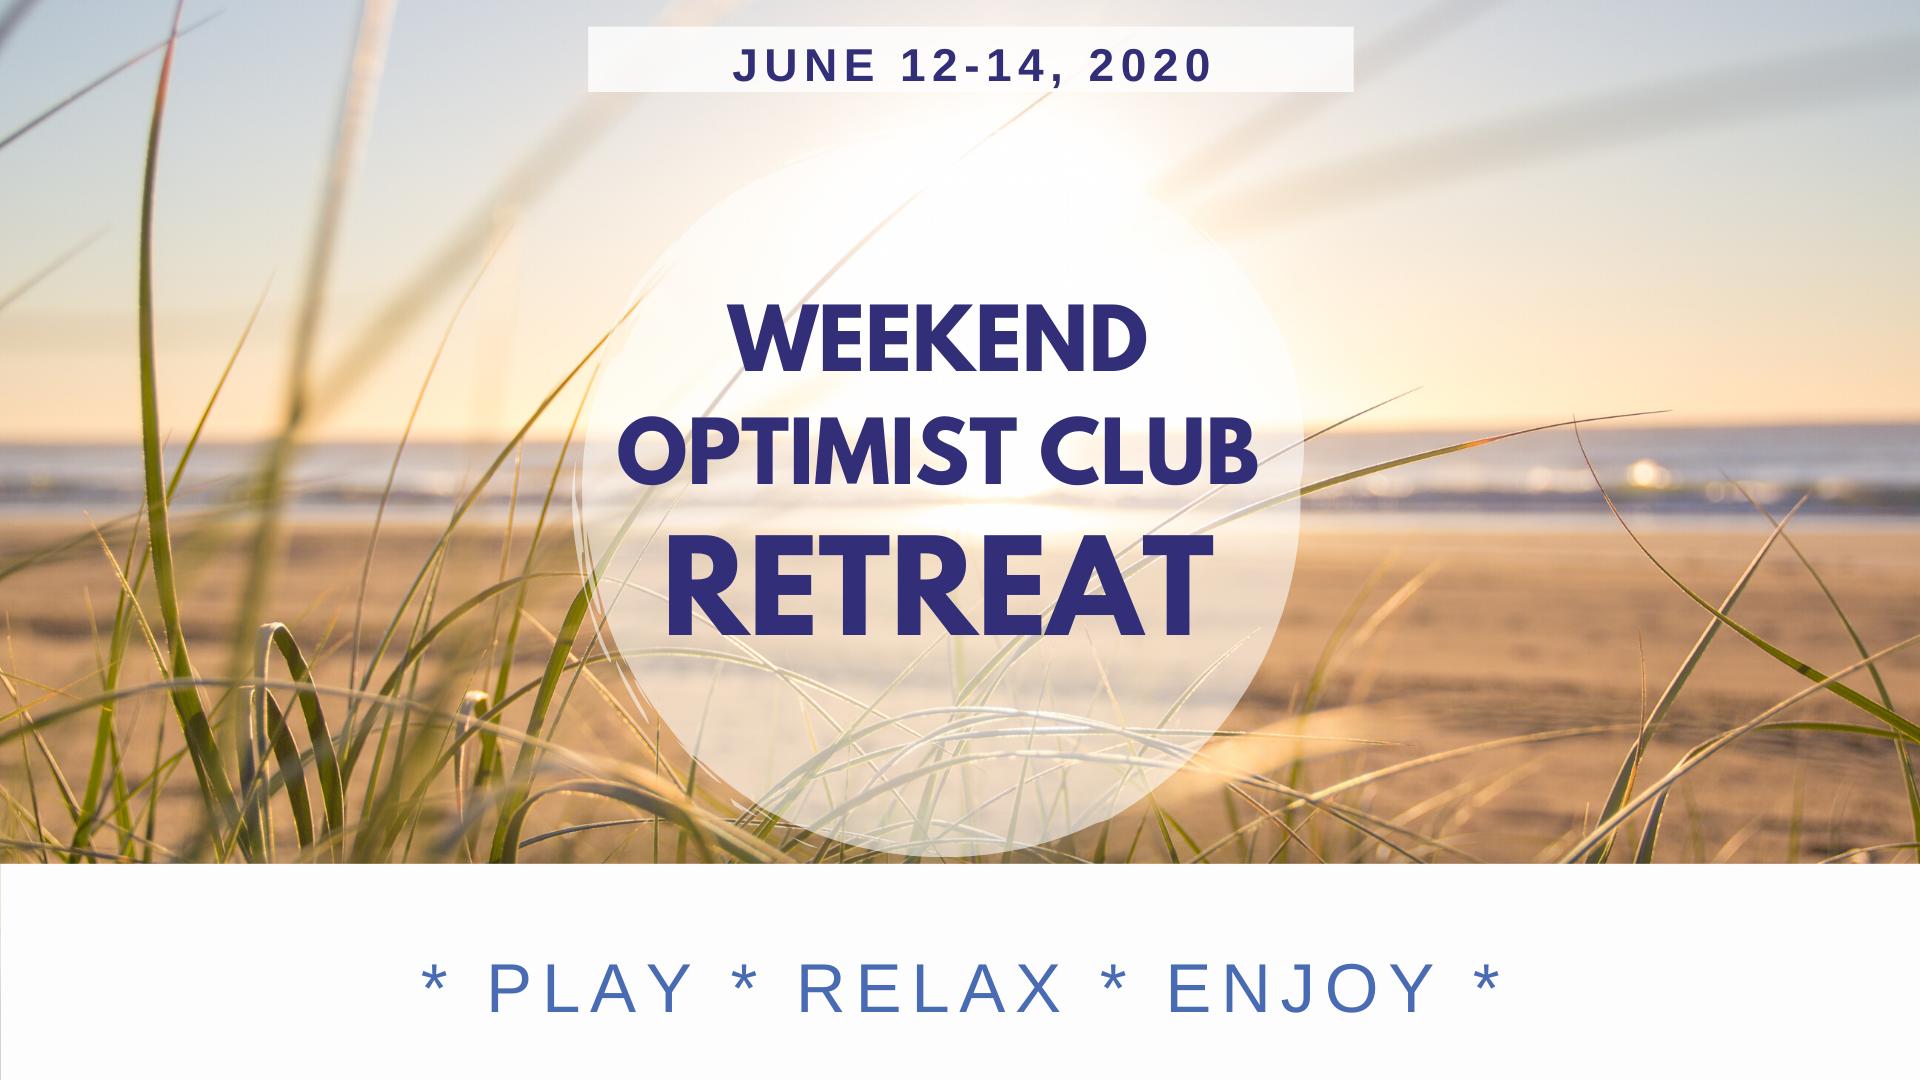 Weekend Optimist Club Retreat